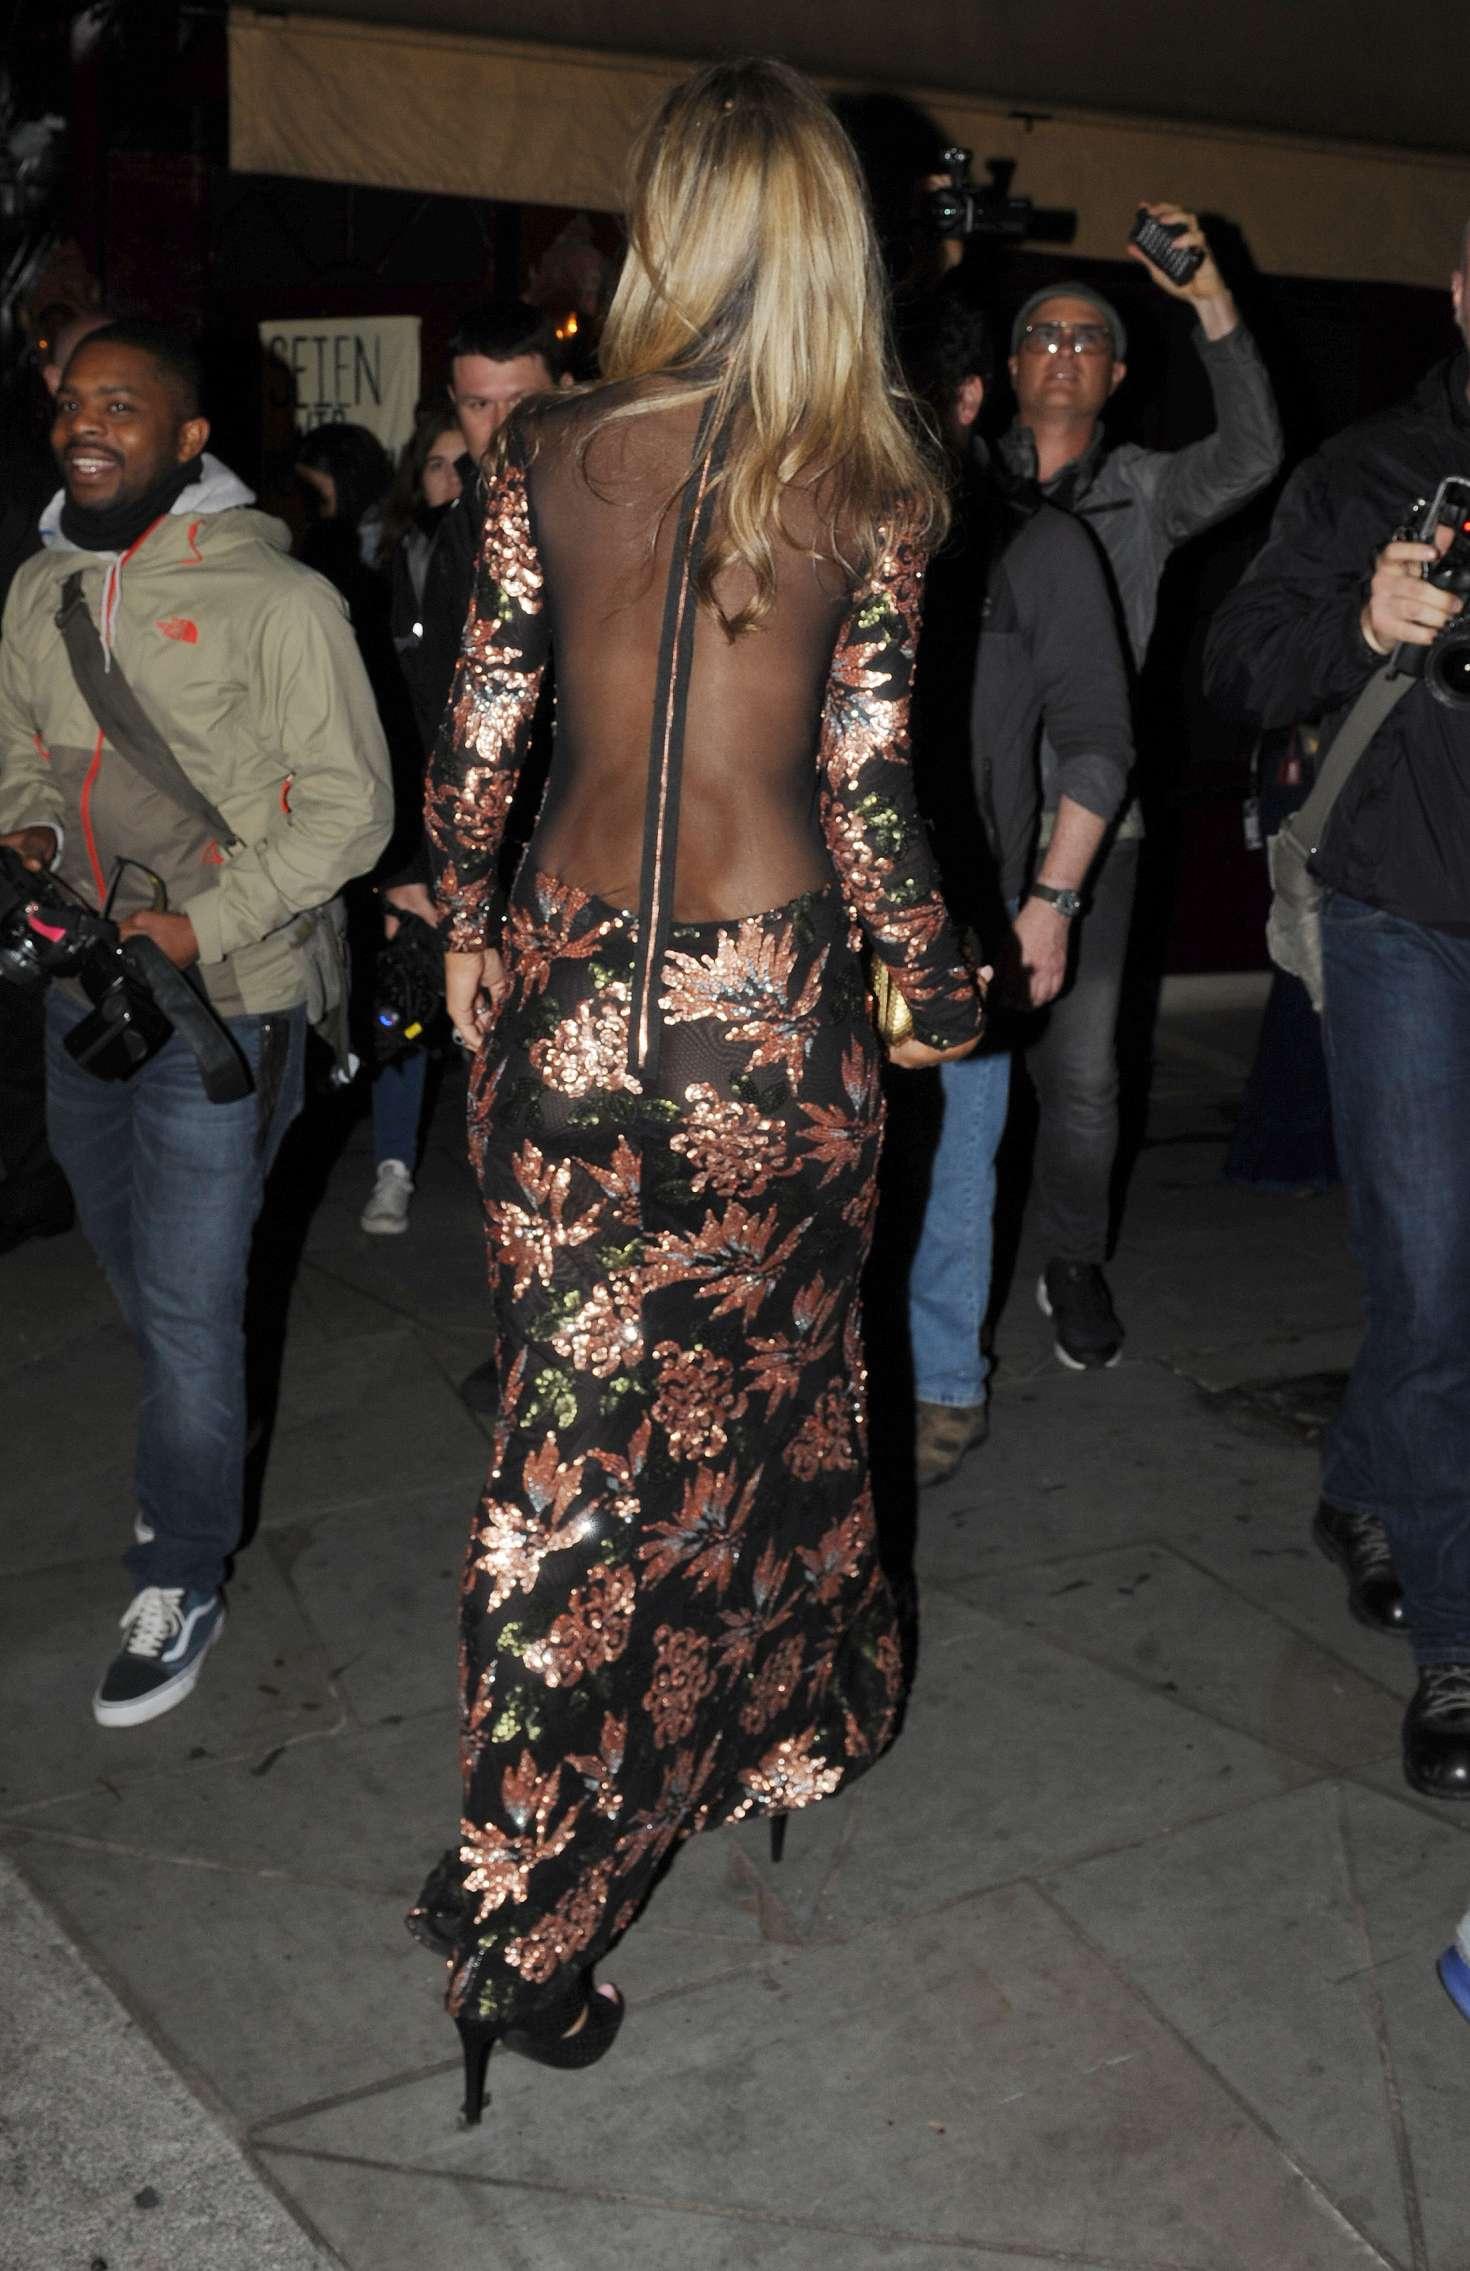 Vittoria ceretti walks saint laurent show in paris,CelebGate Rihanna Hot - 27 Photos Adult video Costanza Caracciolo Nude Photos and Videos,OOPS Fatima Ptacek